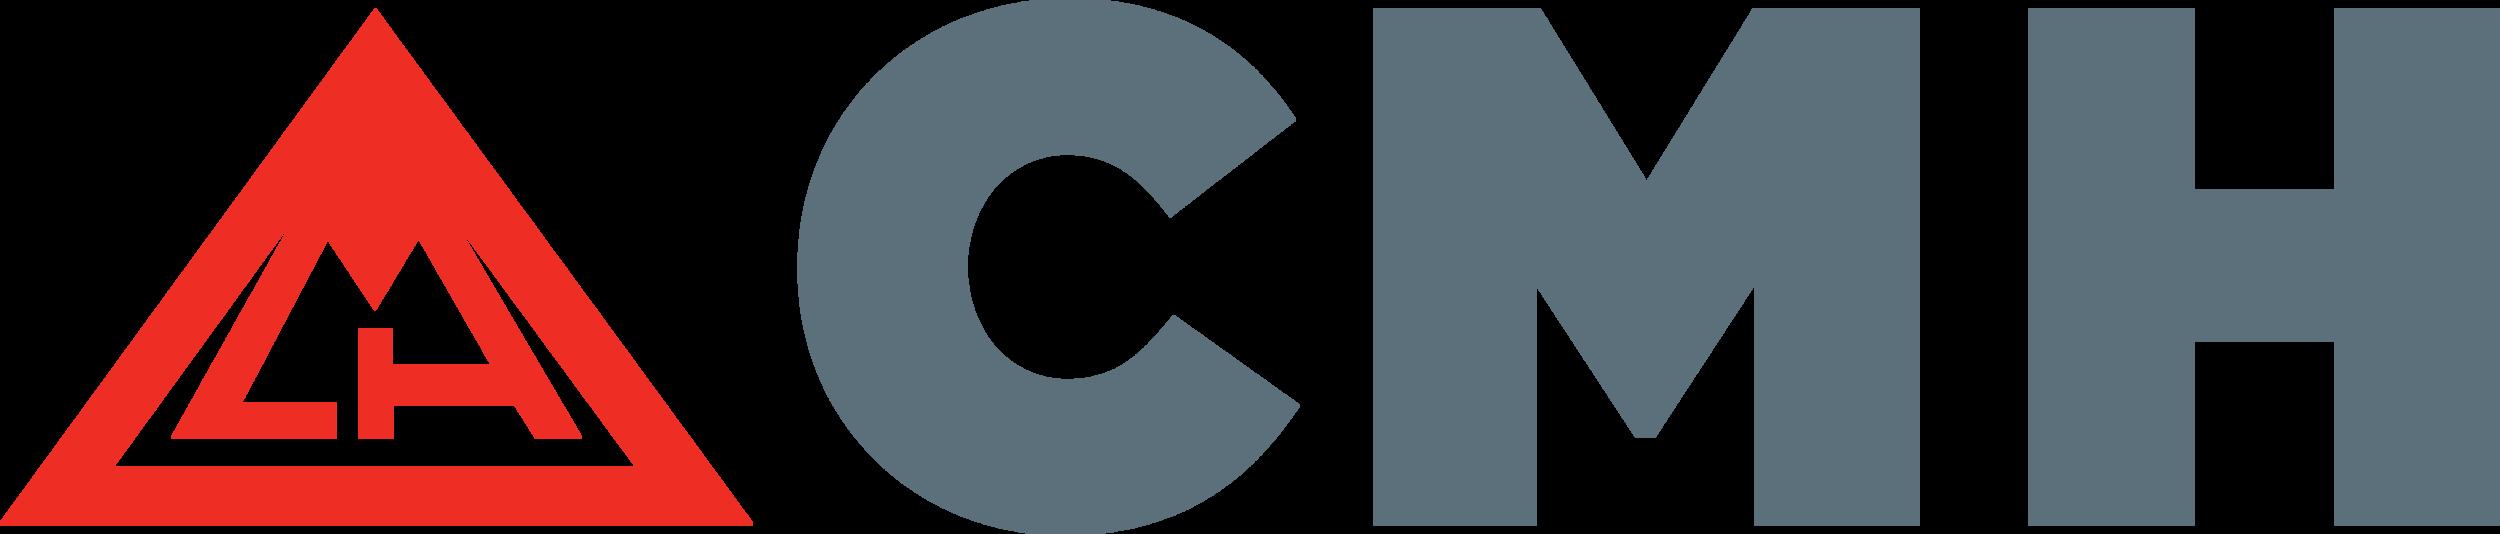 CMH-Generic-StandardLogo.png